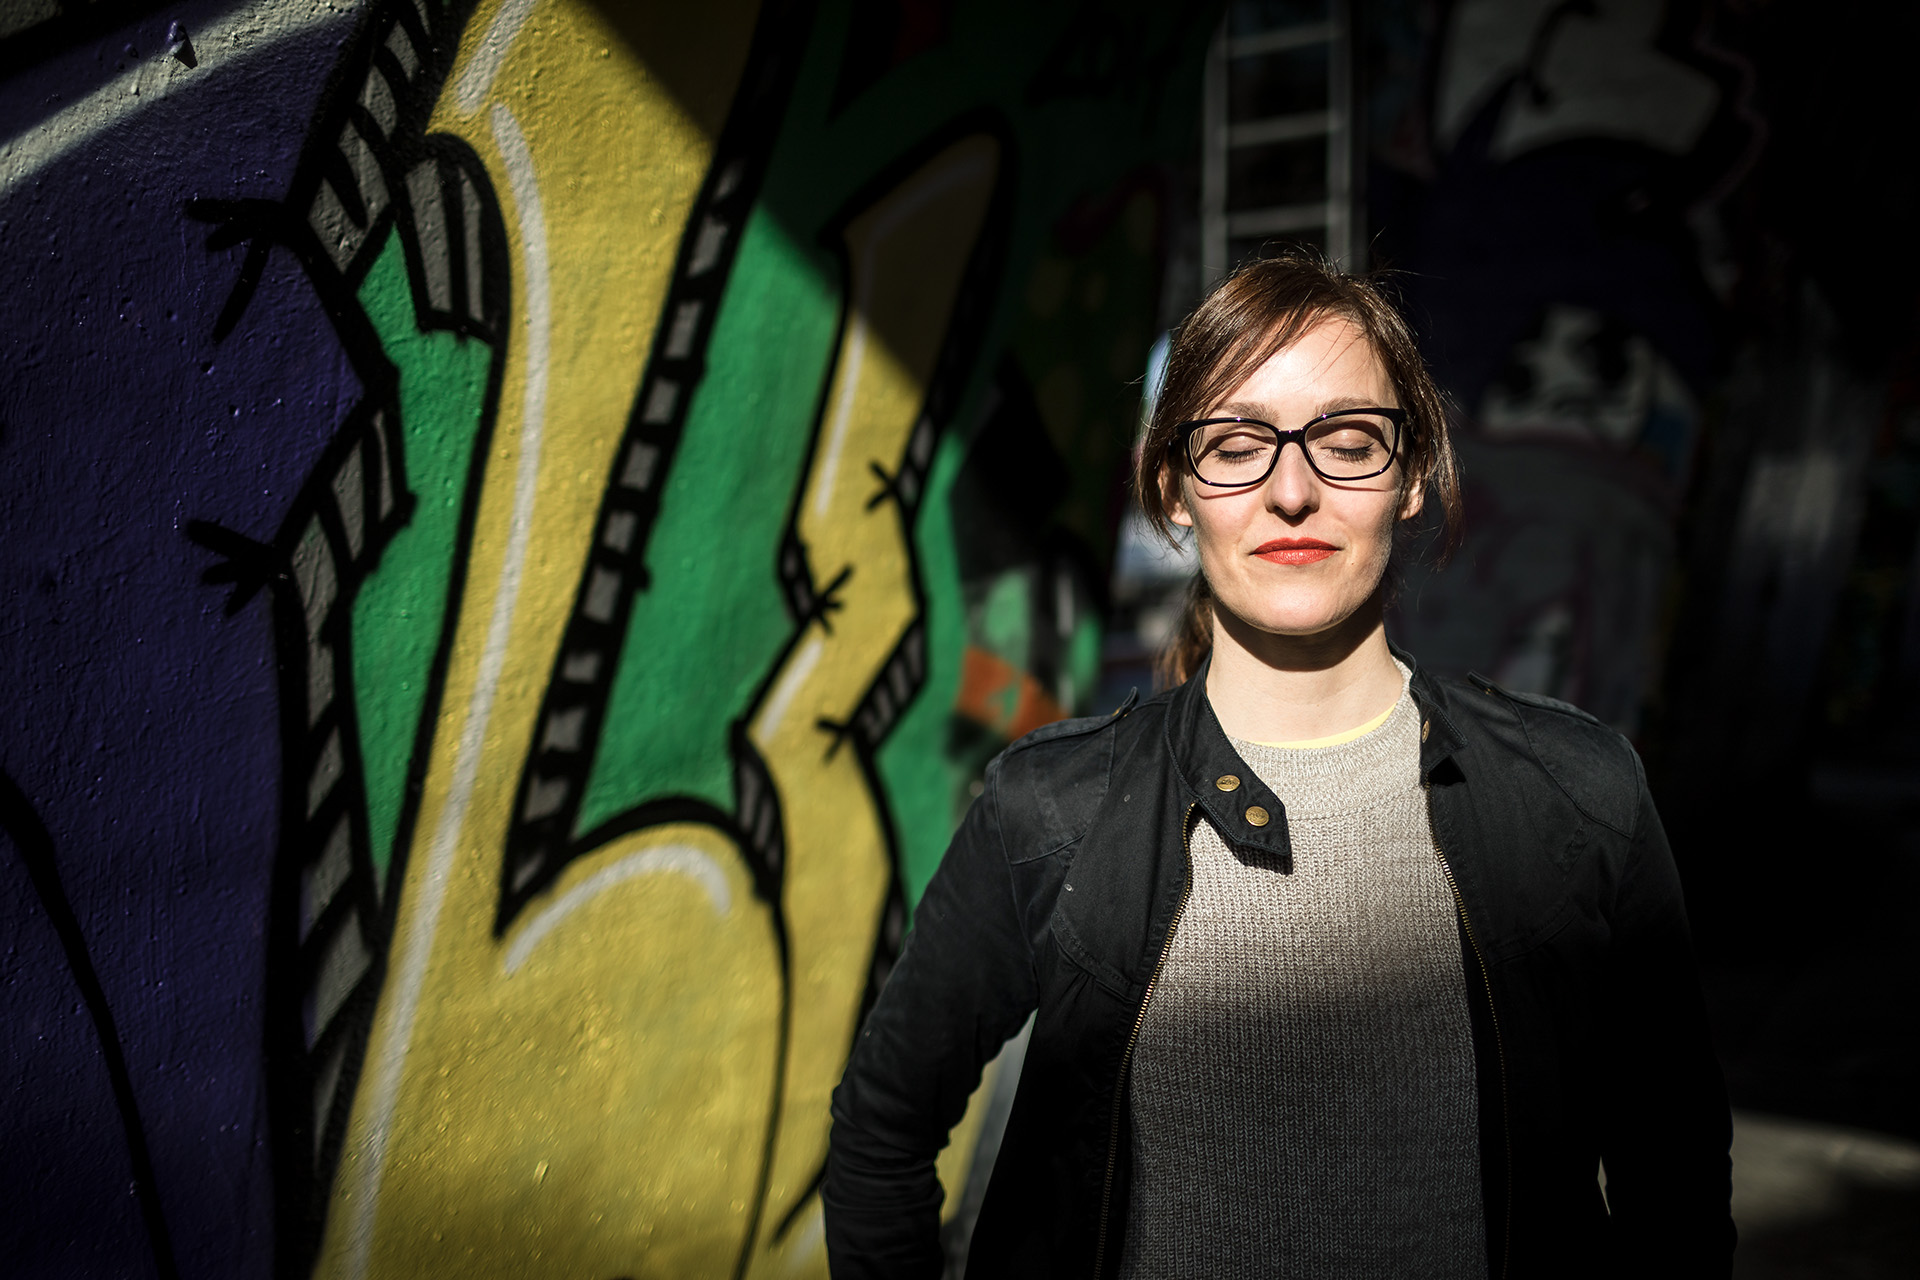 Daniela-Larcher--Alex-Beer--_MG_2298--(C)MichaelMazohl--1280px